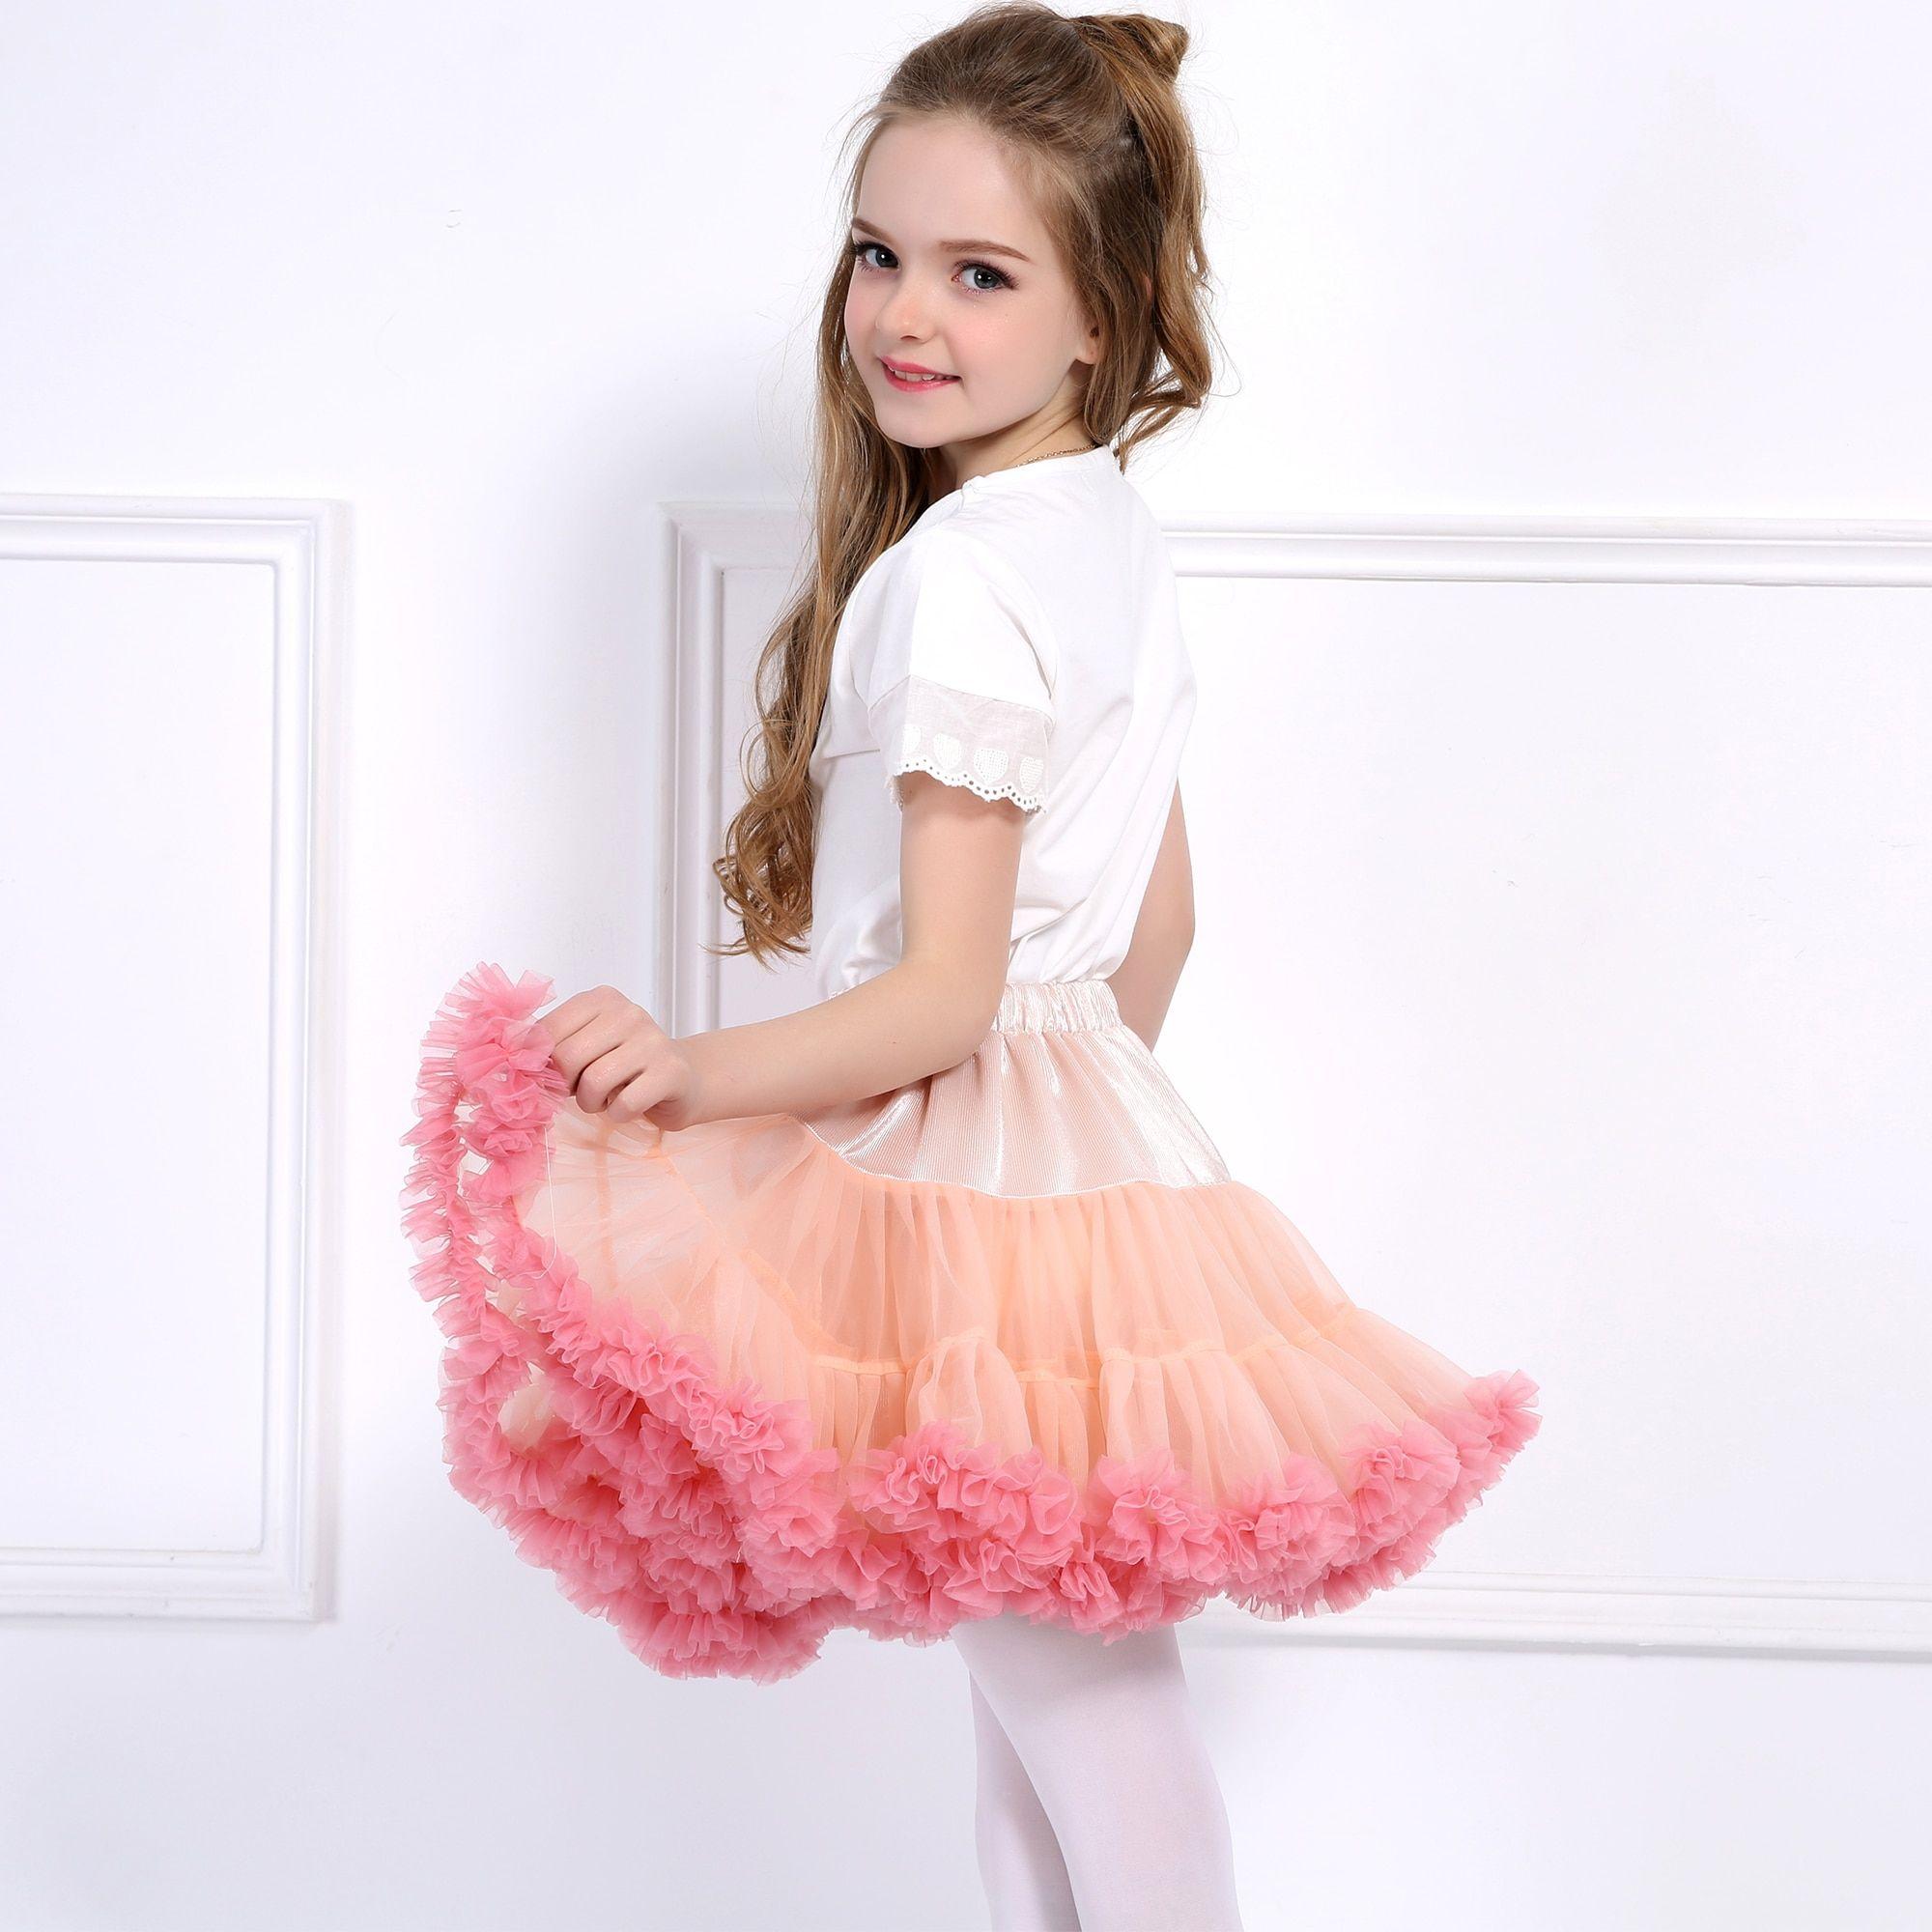 2PCS Baby Girls Floral Princess Pink Tutu Dress Kids Dance Party Headband Outfit